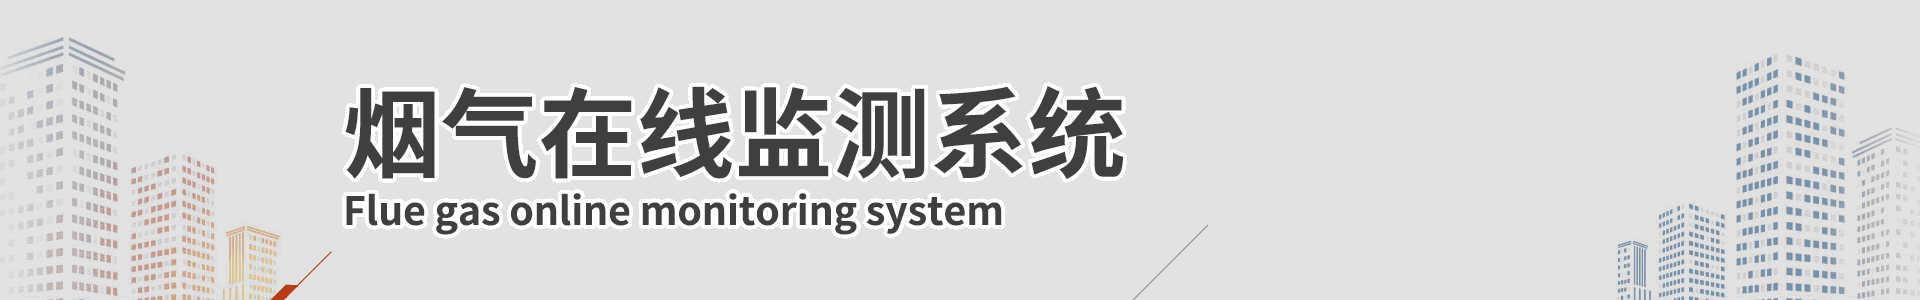 烟气在线监测系统banner